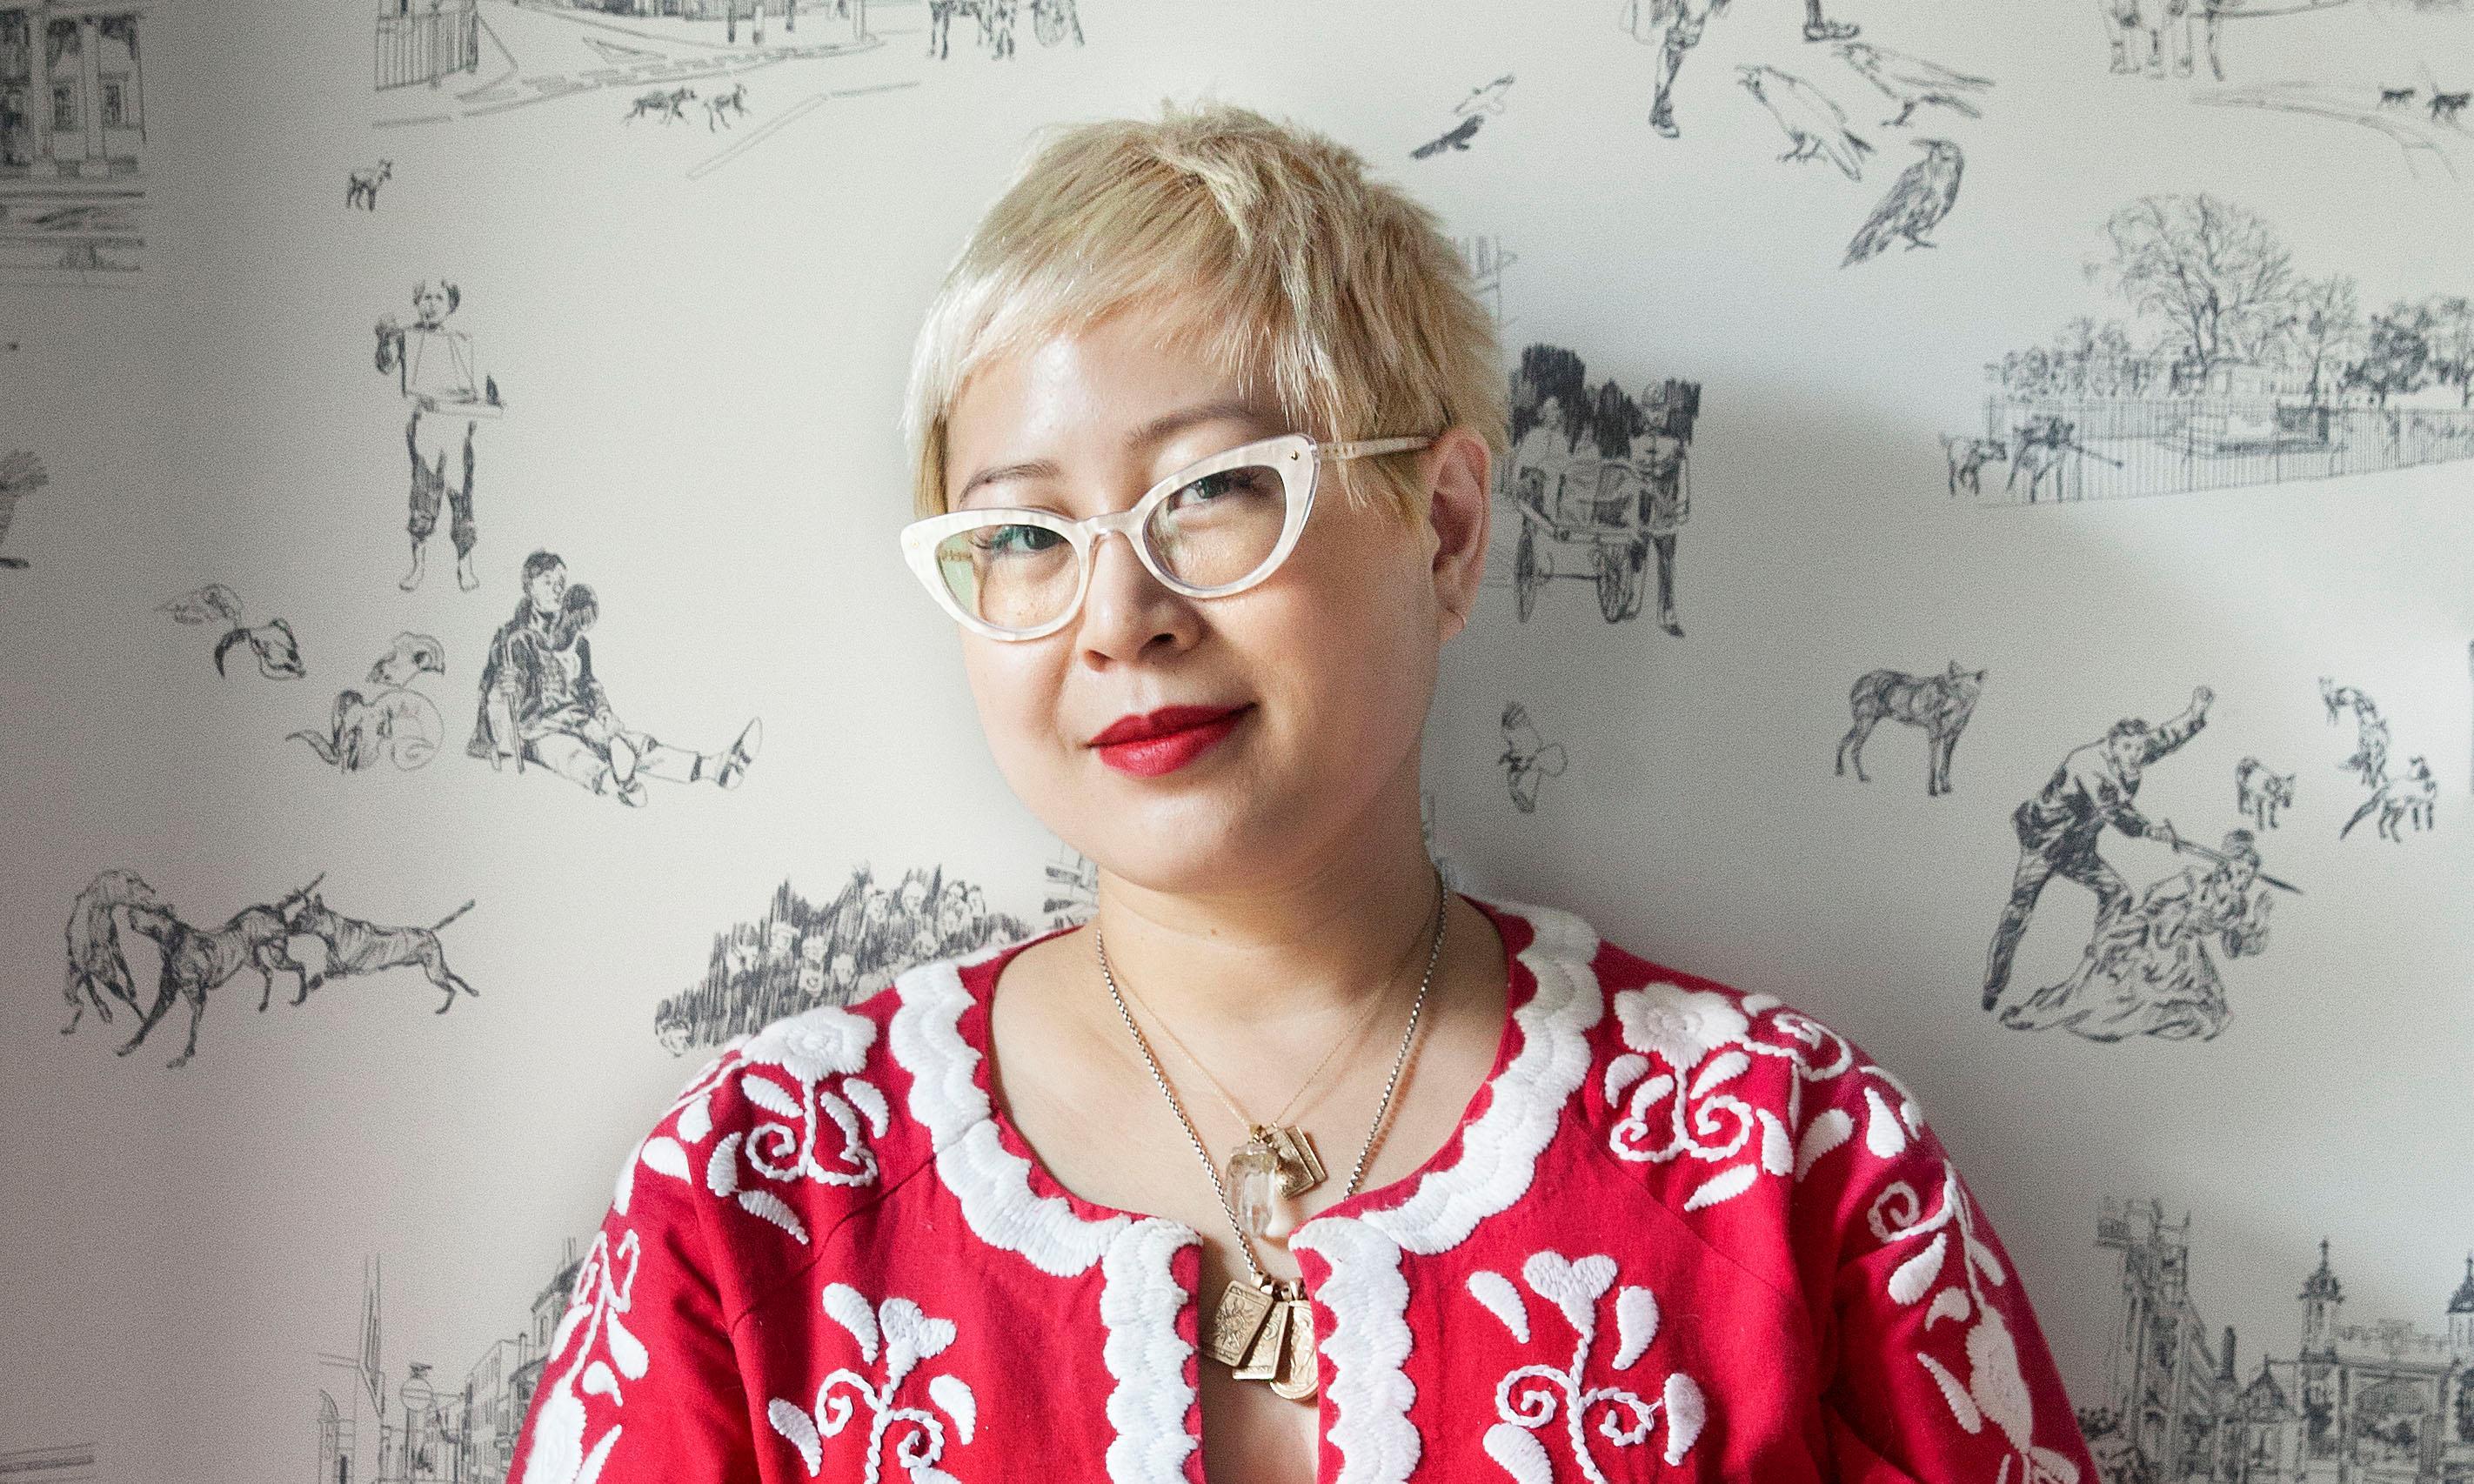 Esmé Weijun Wang: 'I don't want to glamorise mental illness… it inhibits creativity'